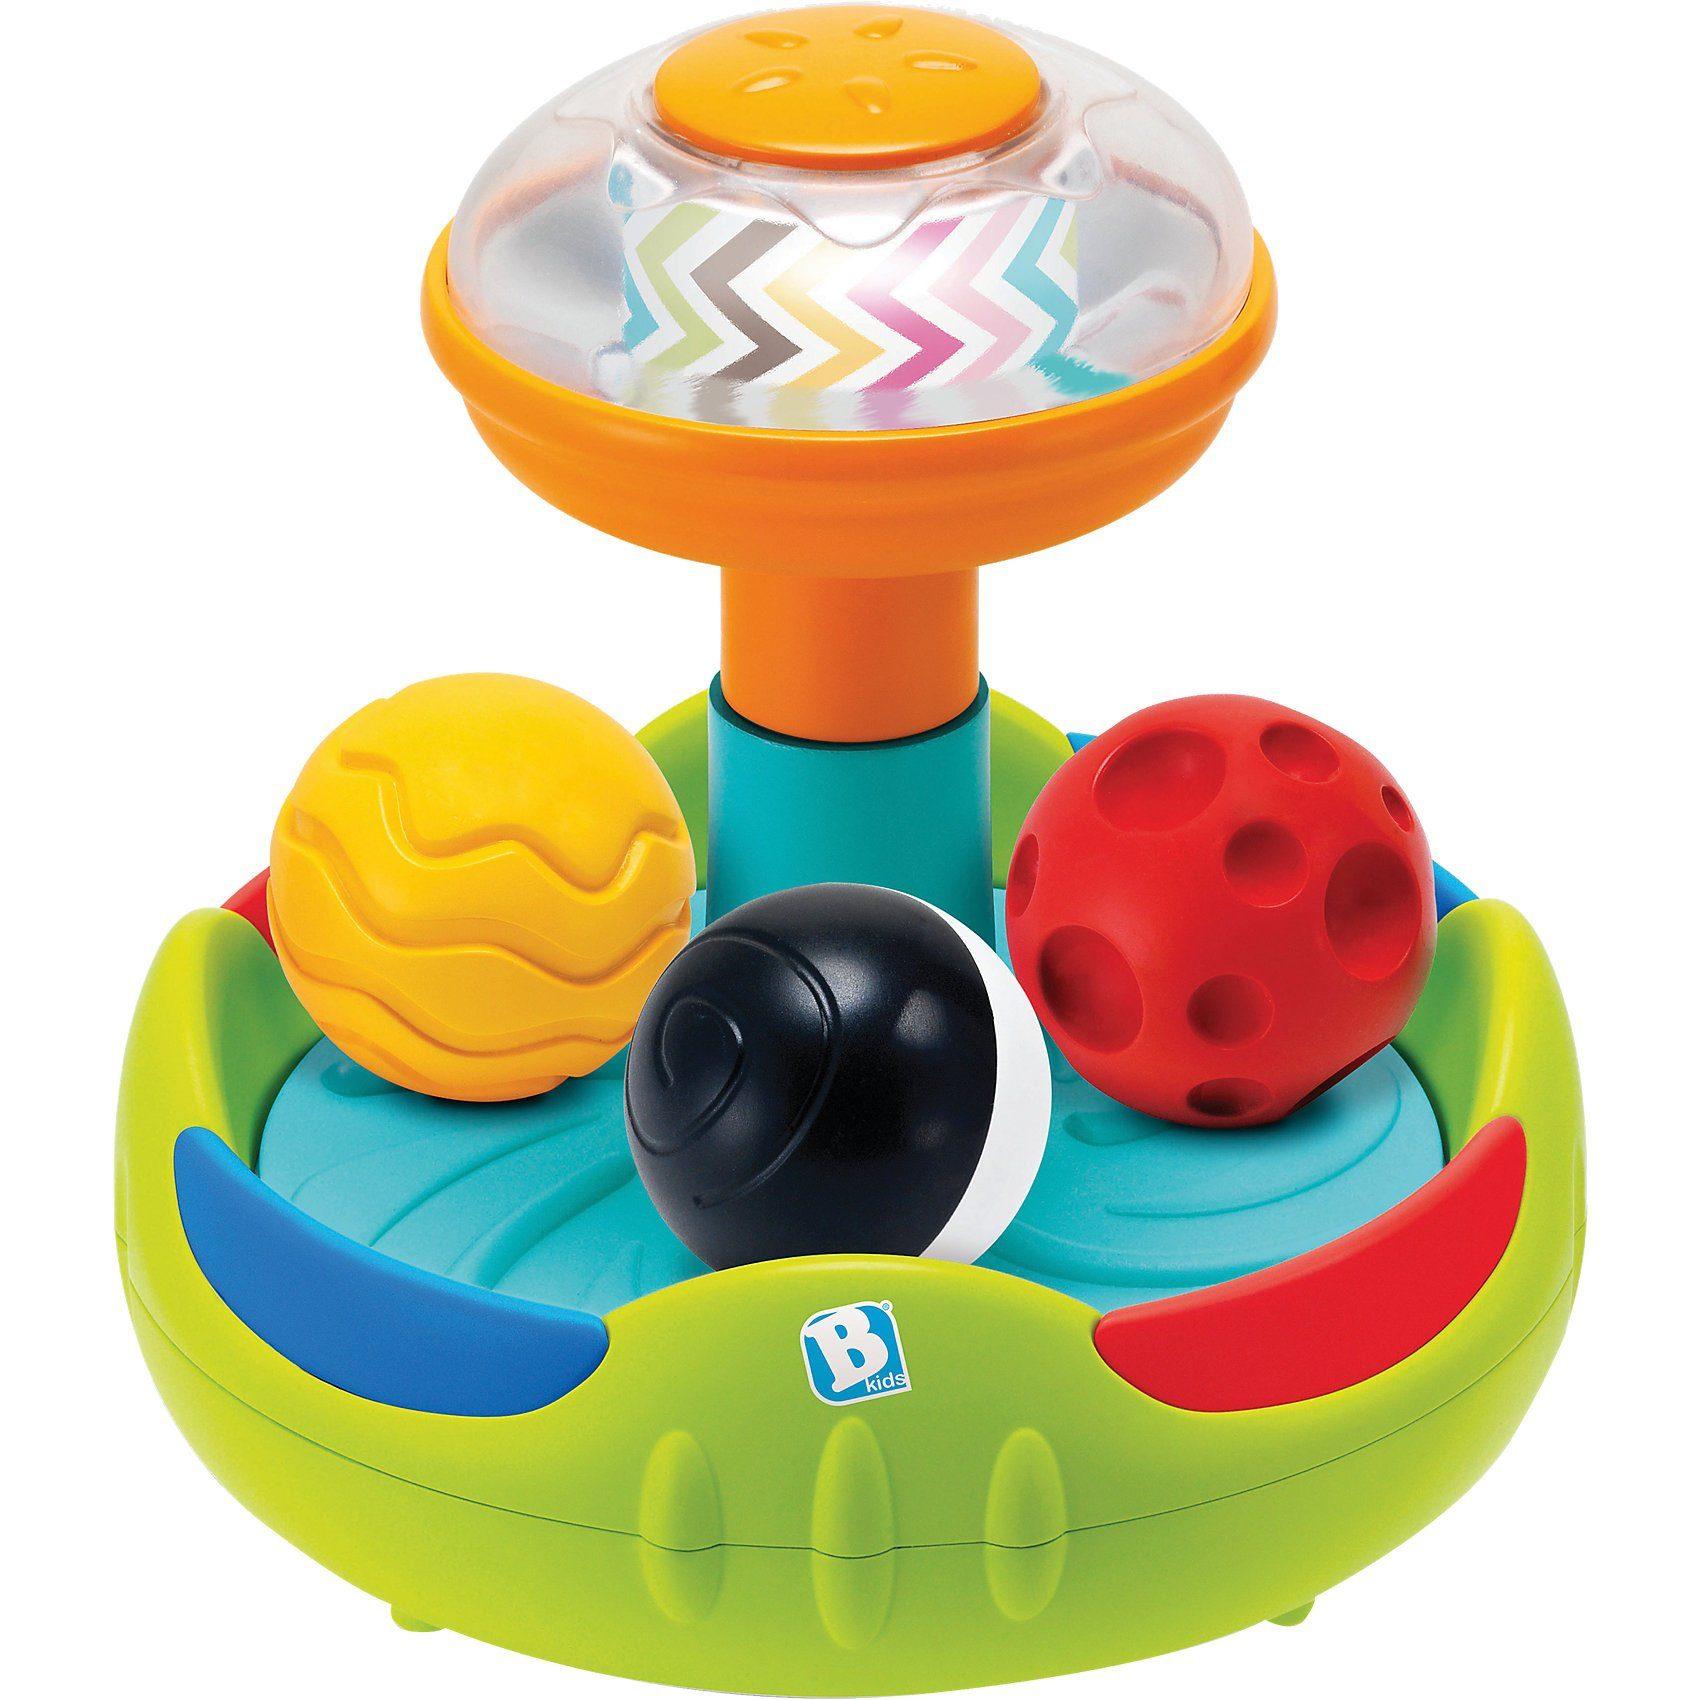 Senso Spinning Ball Top - Sensorik Kreisel